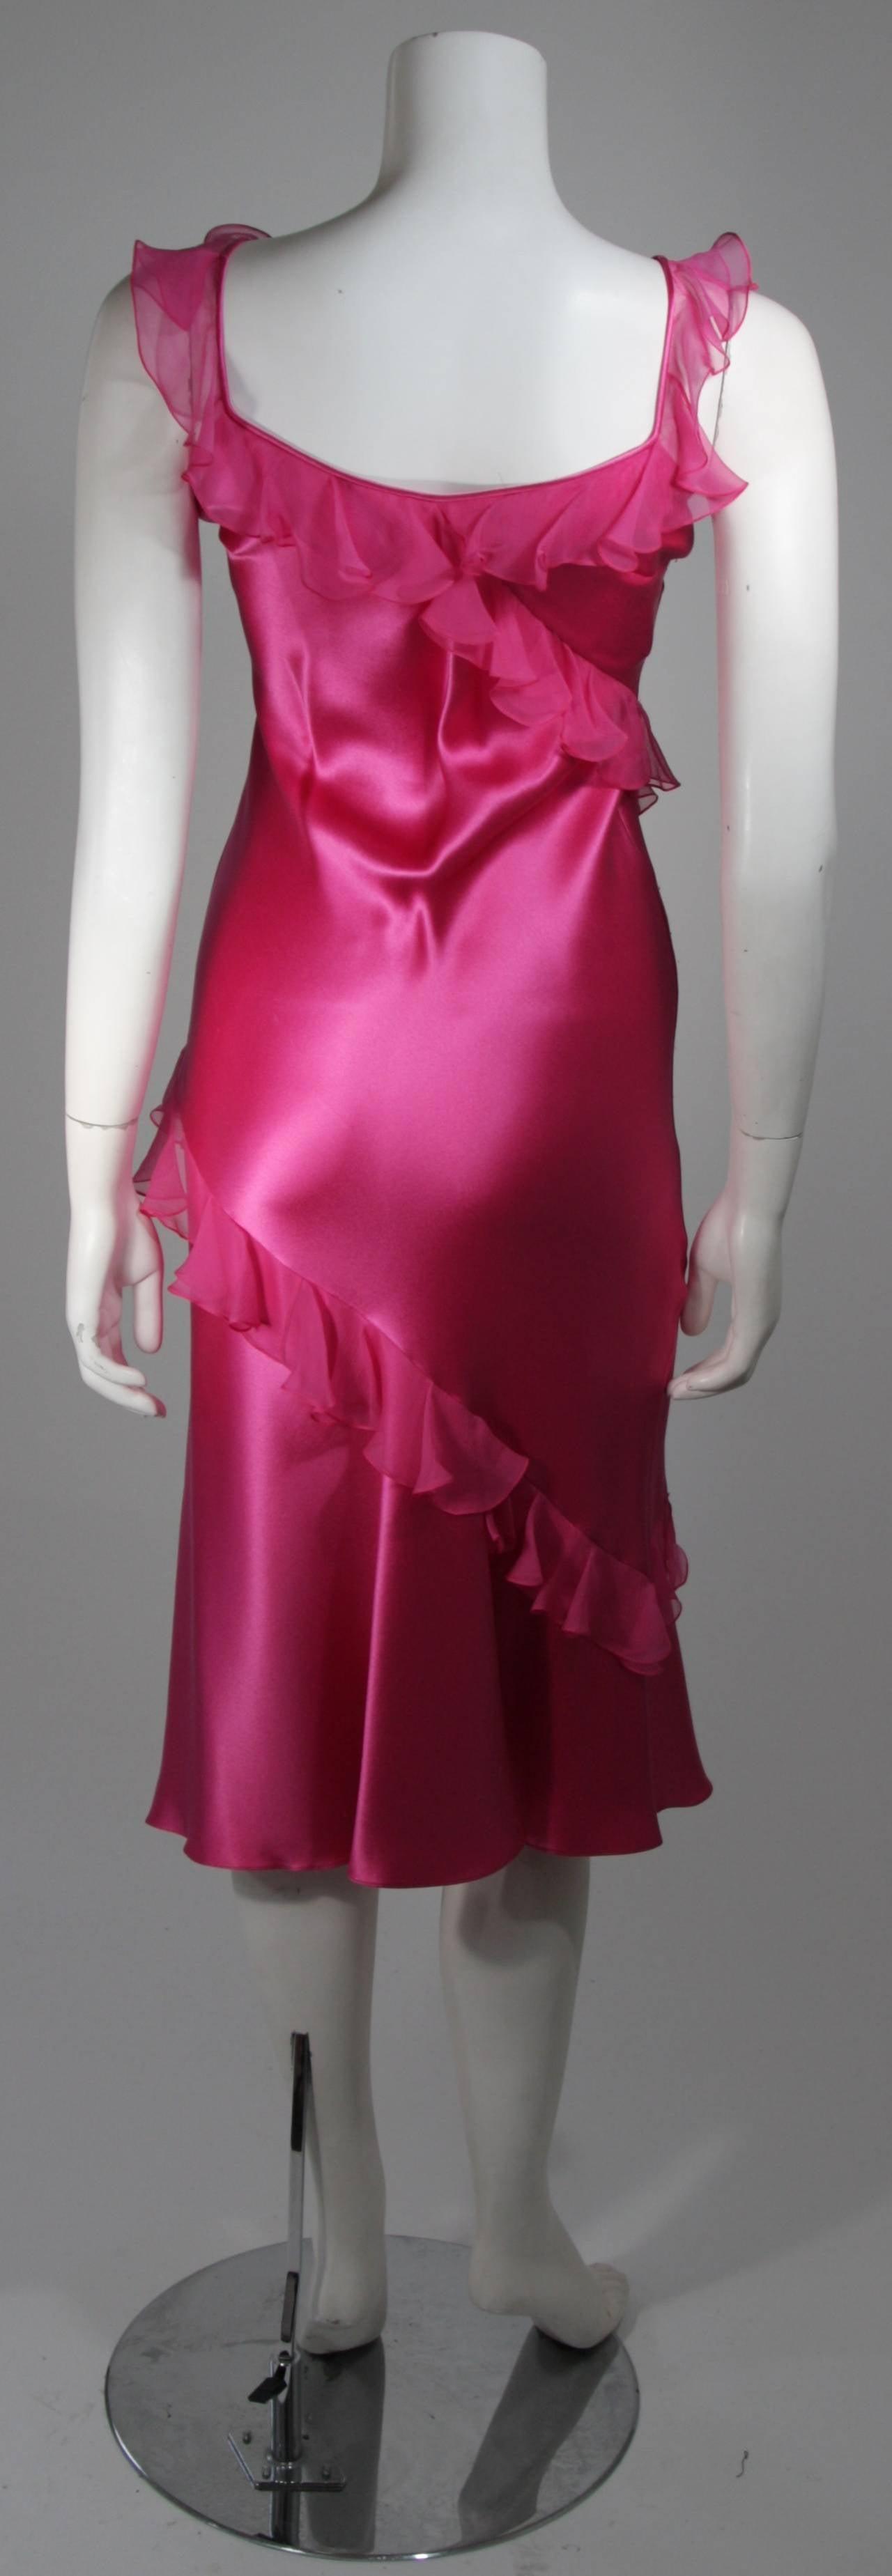 Women's Christina Dior Ruffled Pink Silk Chiffon Dress Size XS For Sale